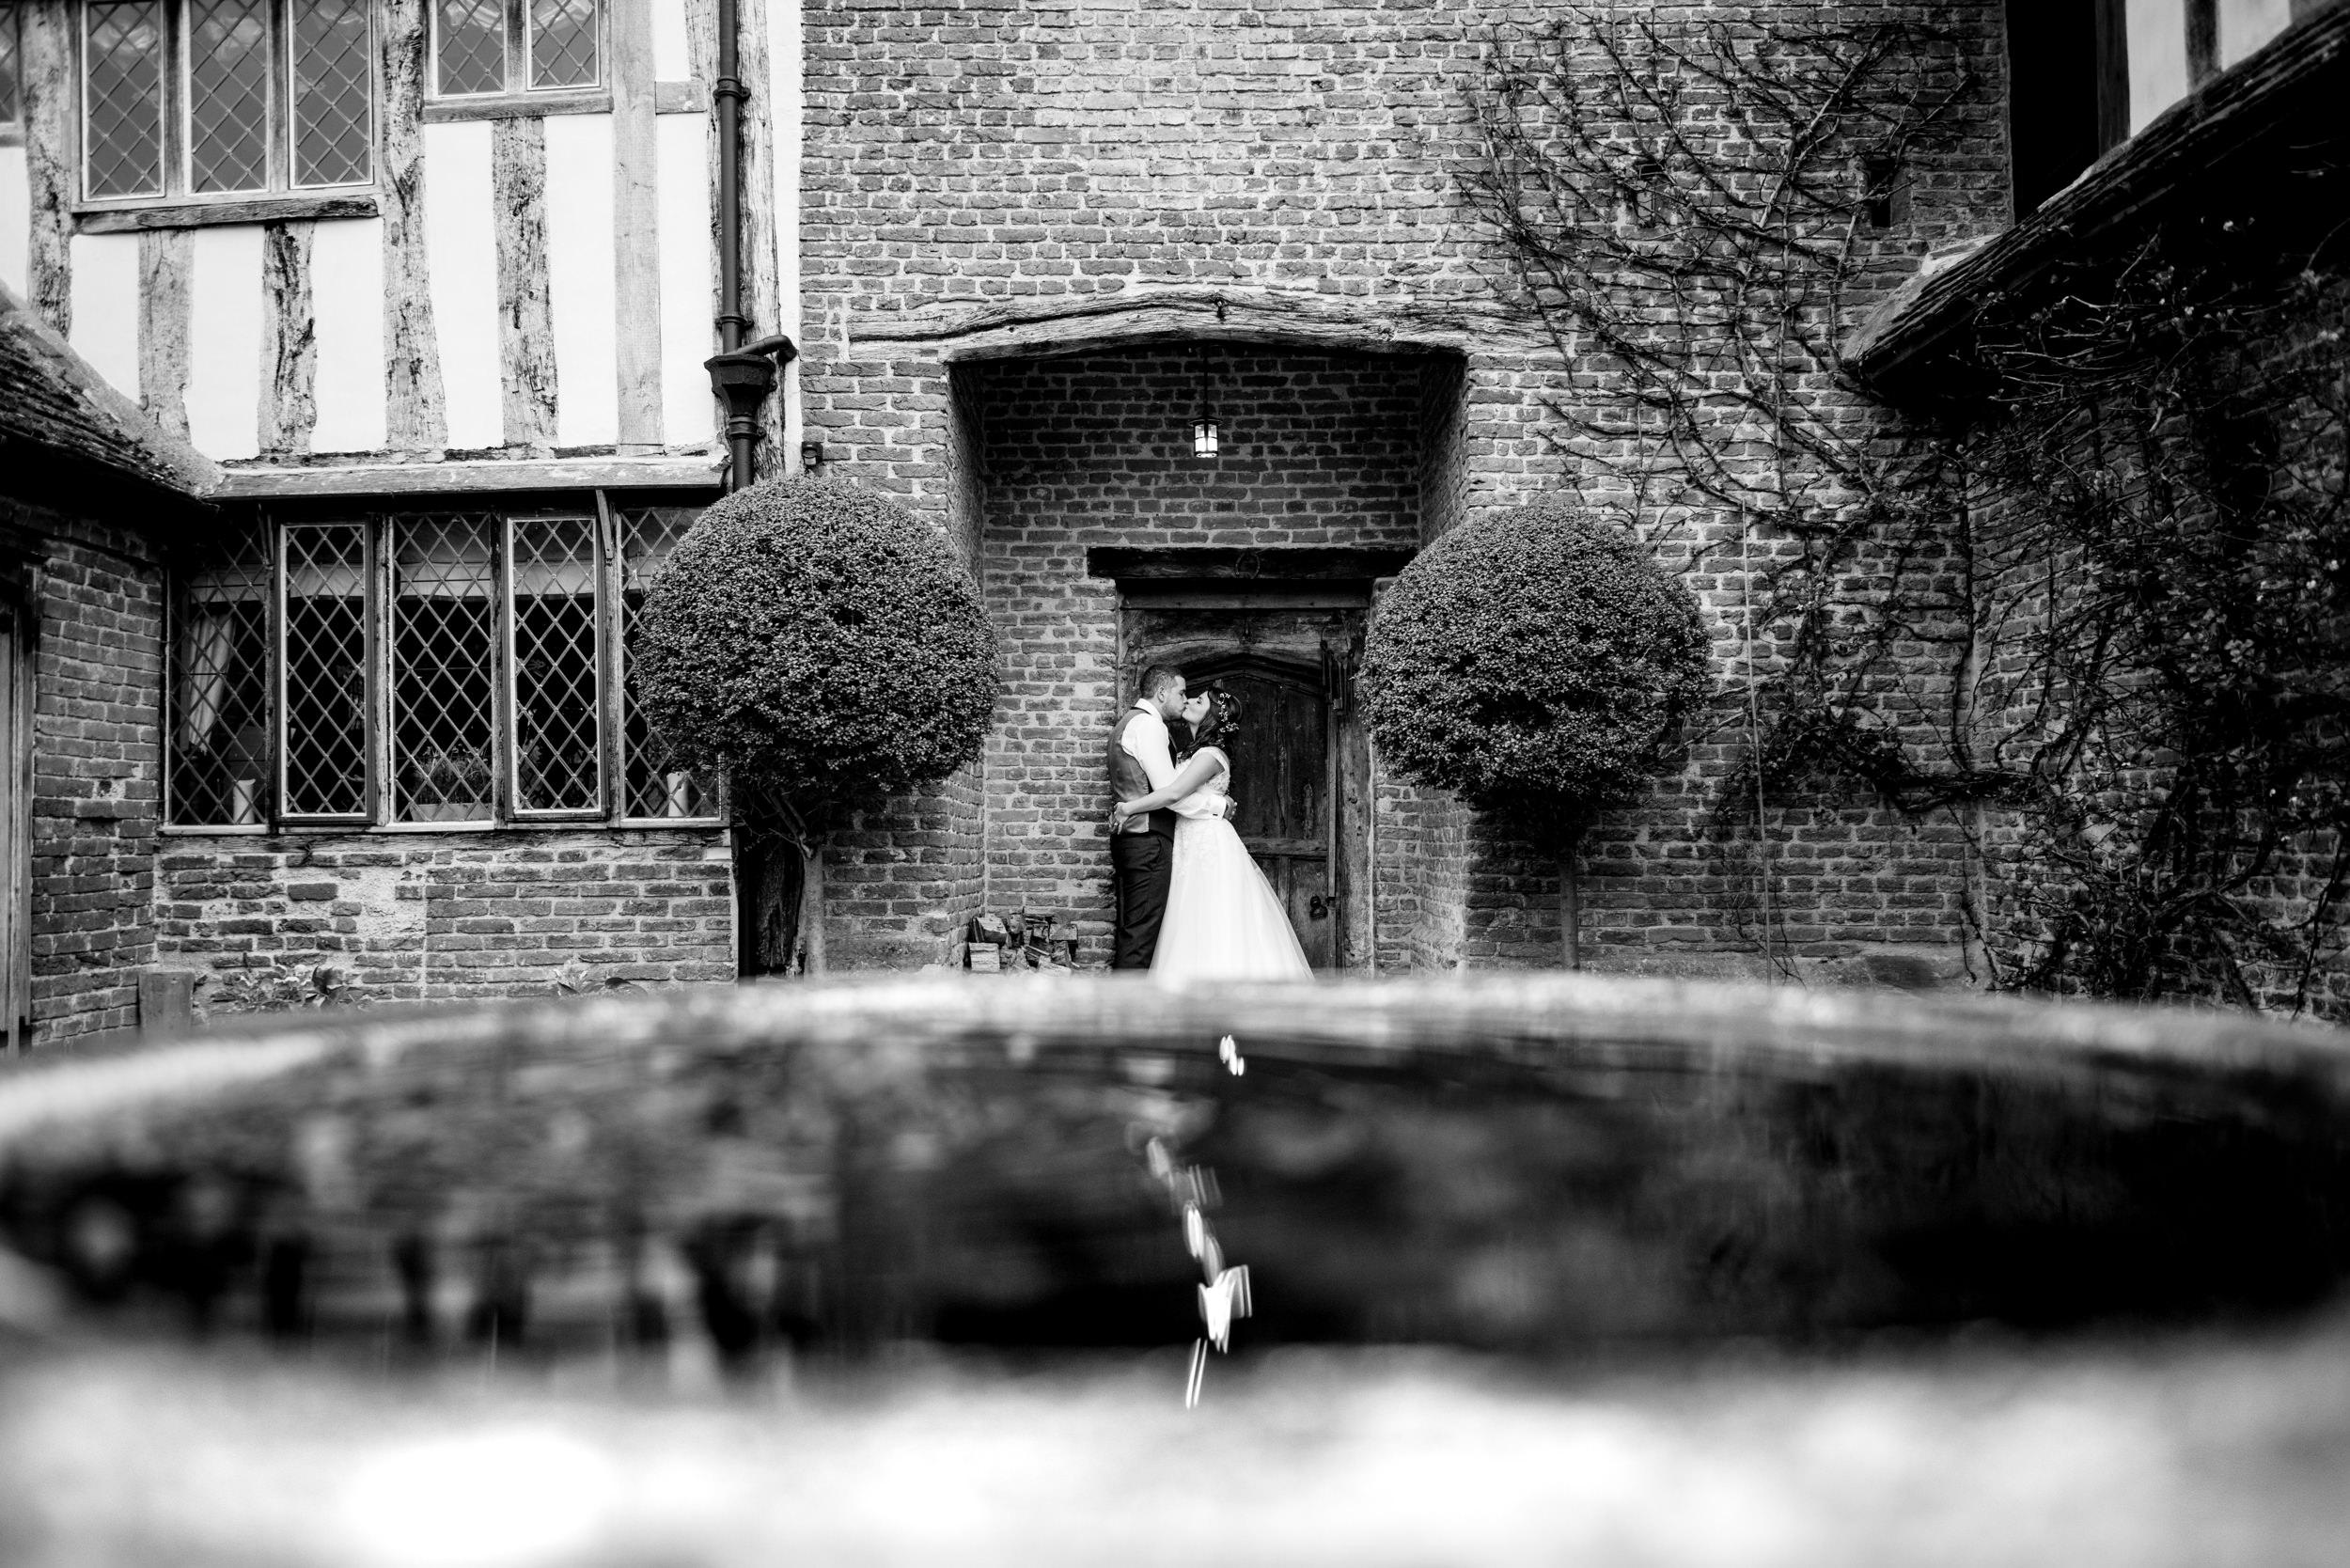 Newlywed kissing and reflected in a bird bath at Grafton Manor Worcs